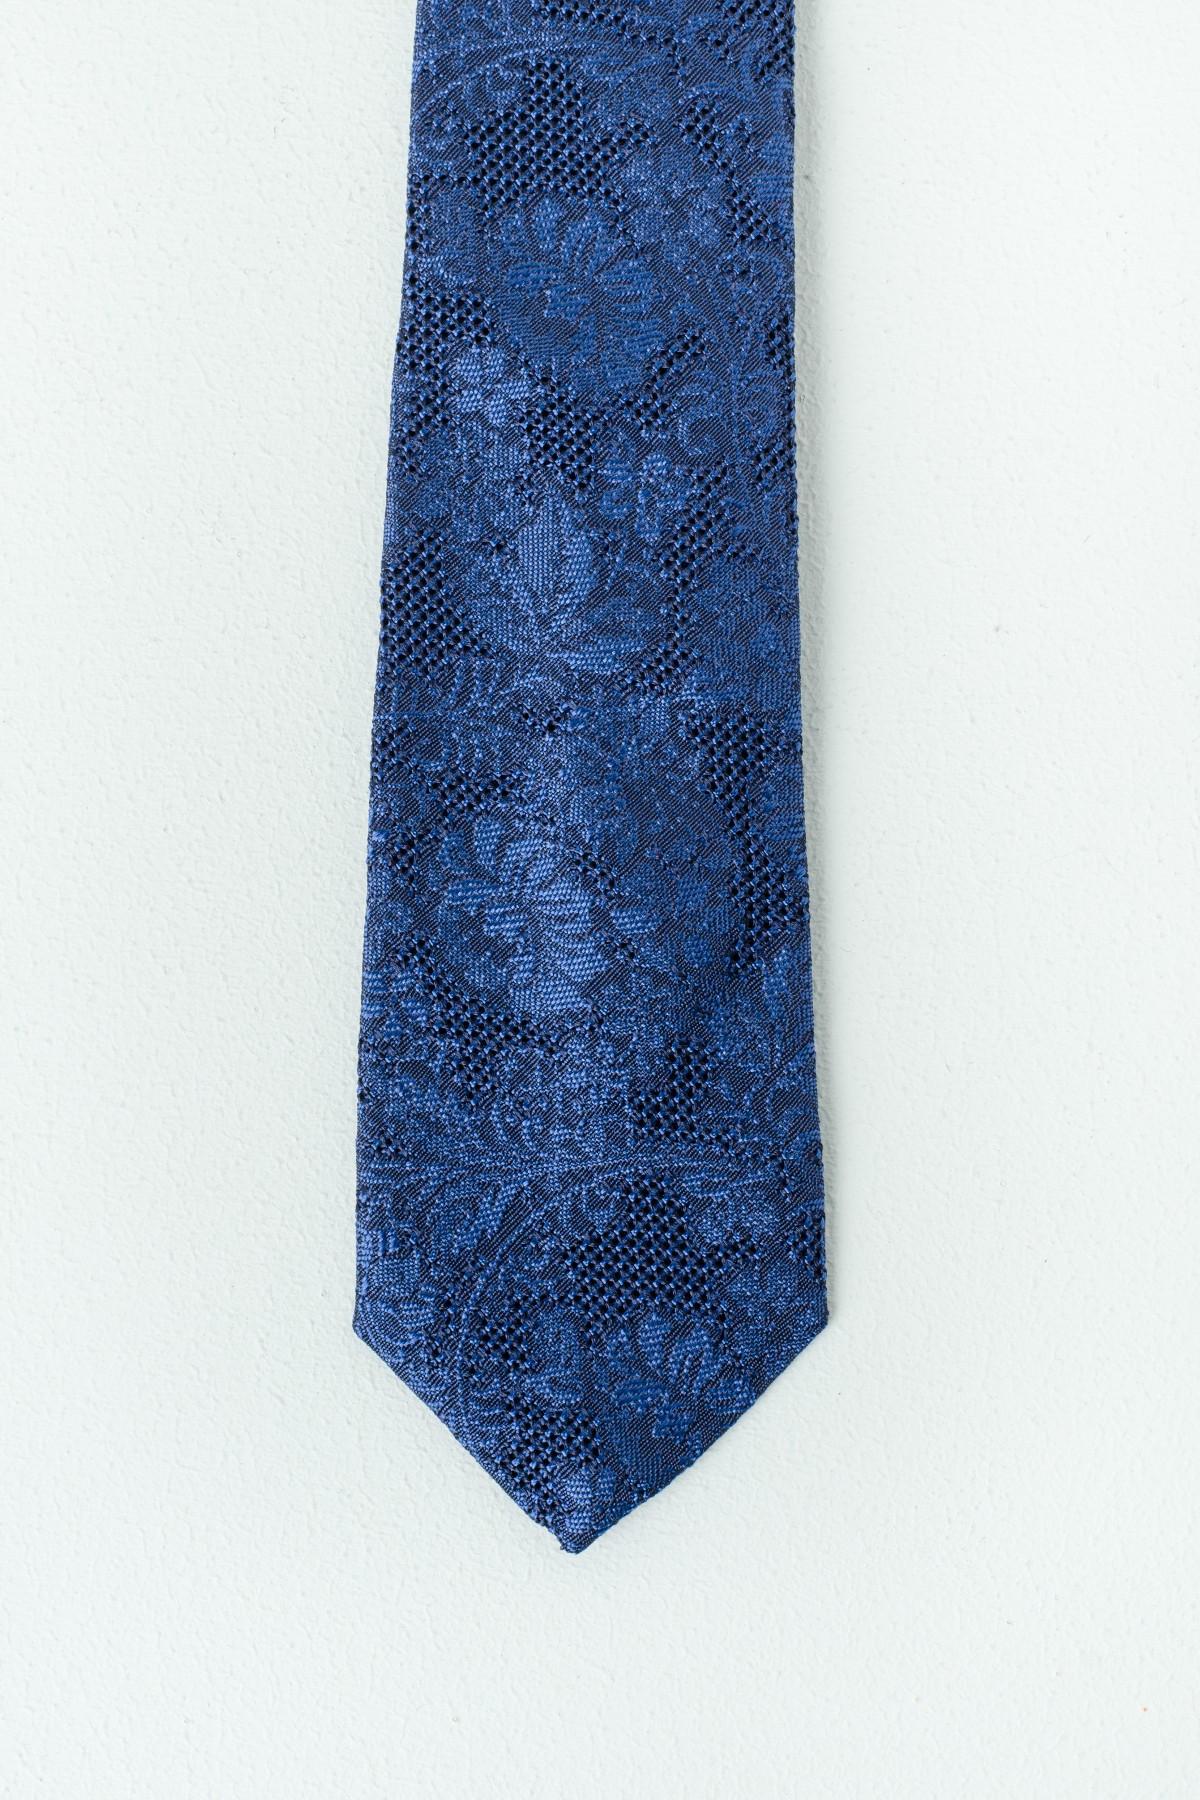 hot sale online 7d3e1 dbec5 Cravatta ETRO blu P/E17 - Rione Fontana